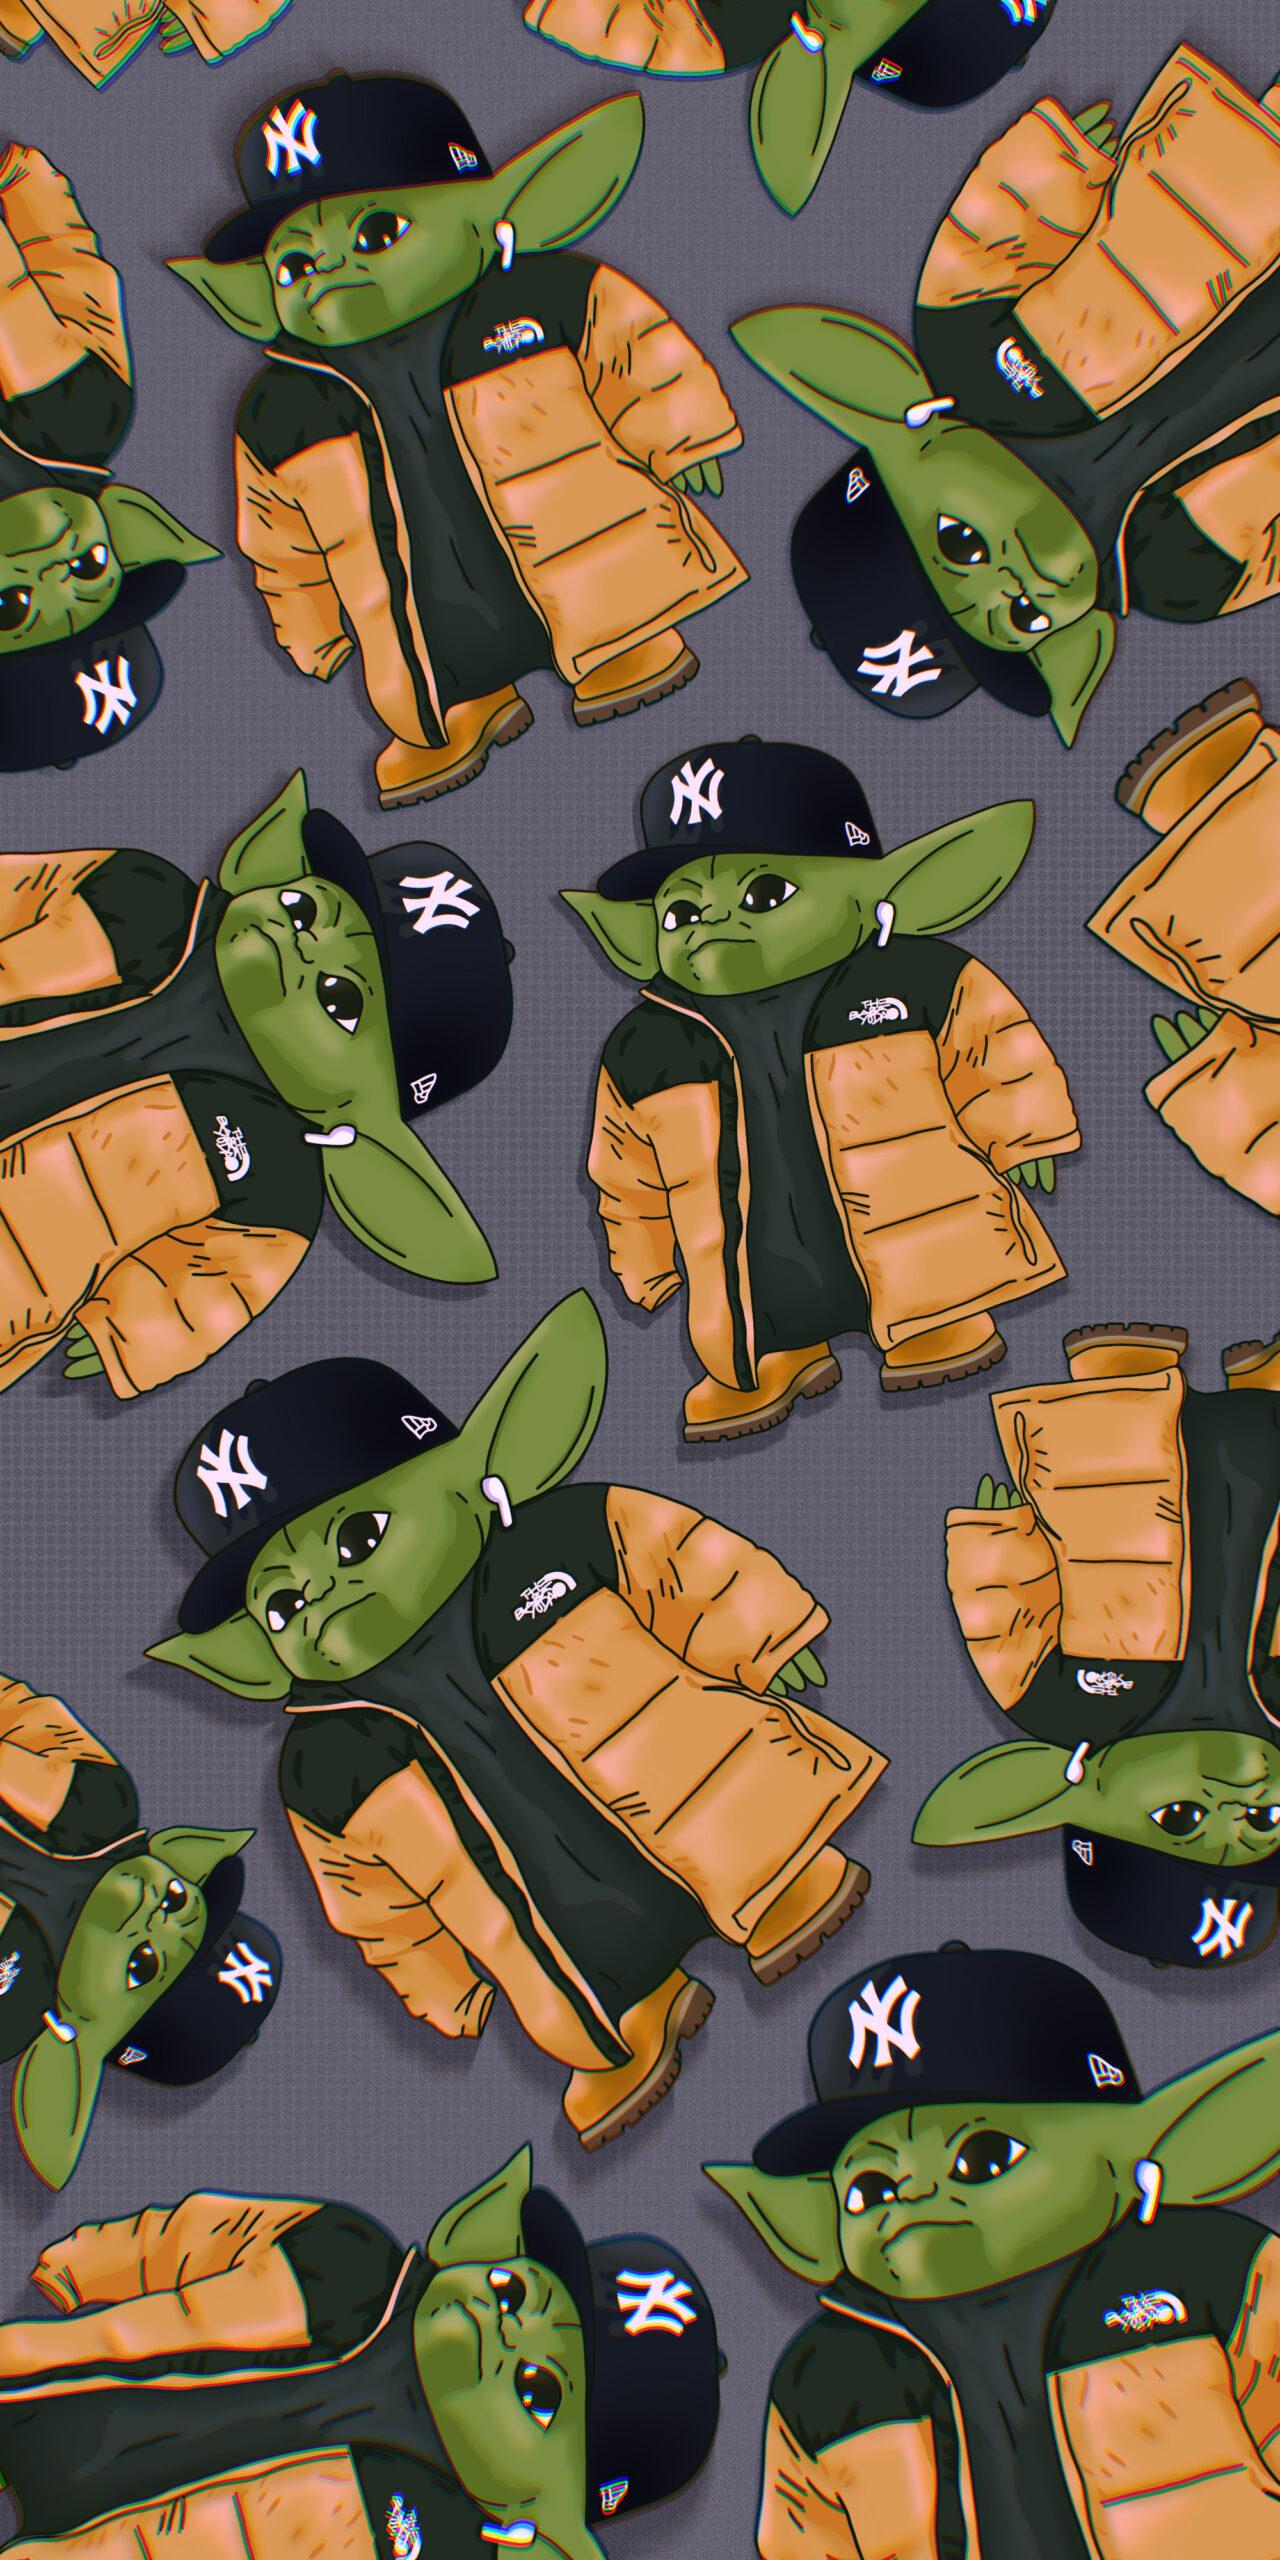 new york baby yoda meme wallpaper